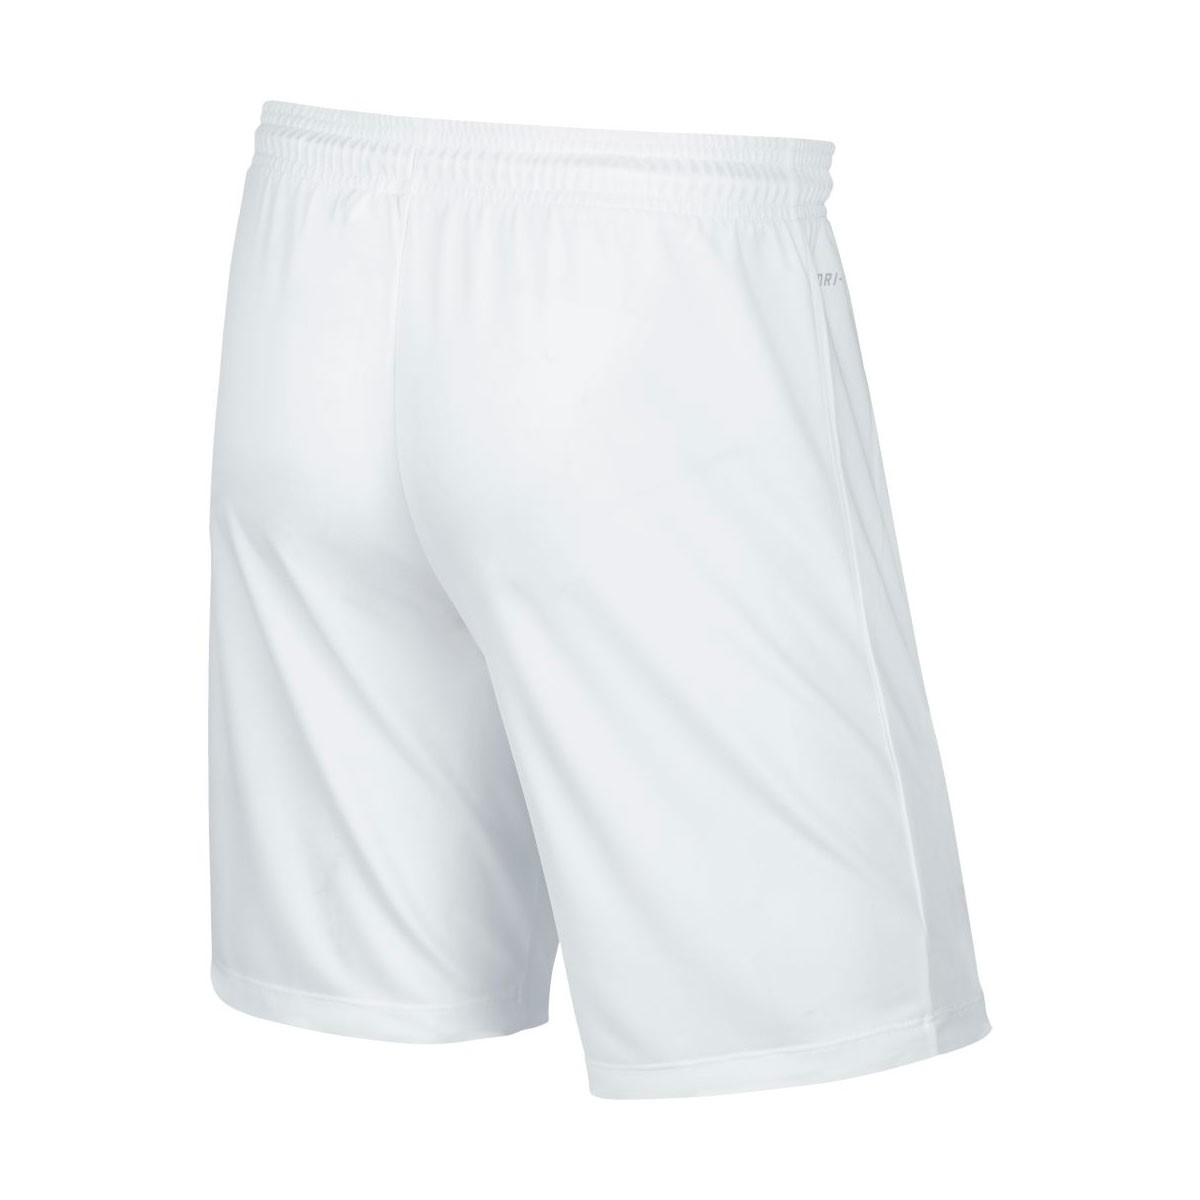 Pantalón Knit Corto Ii White Soccer Leaked San Nike Roque Park Black dIIwWqr7P